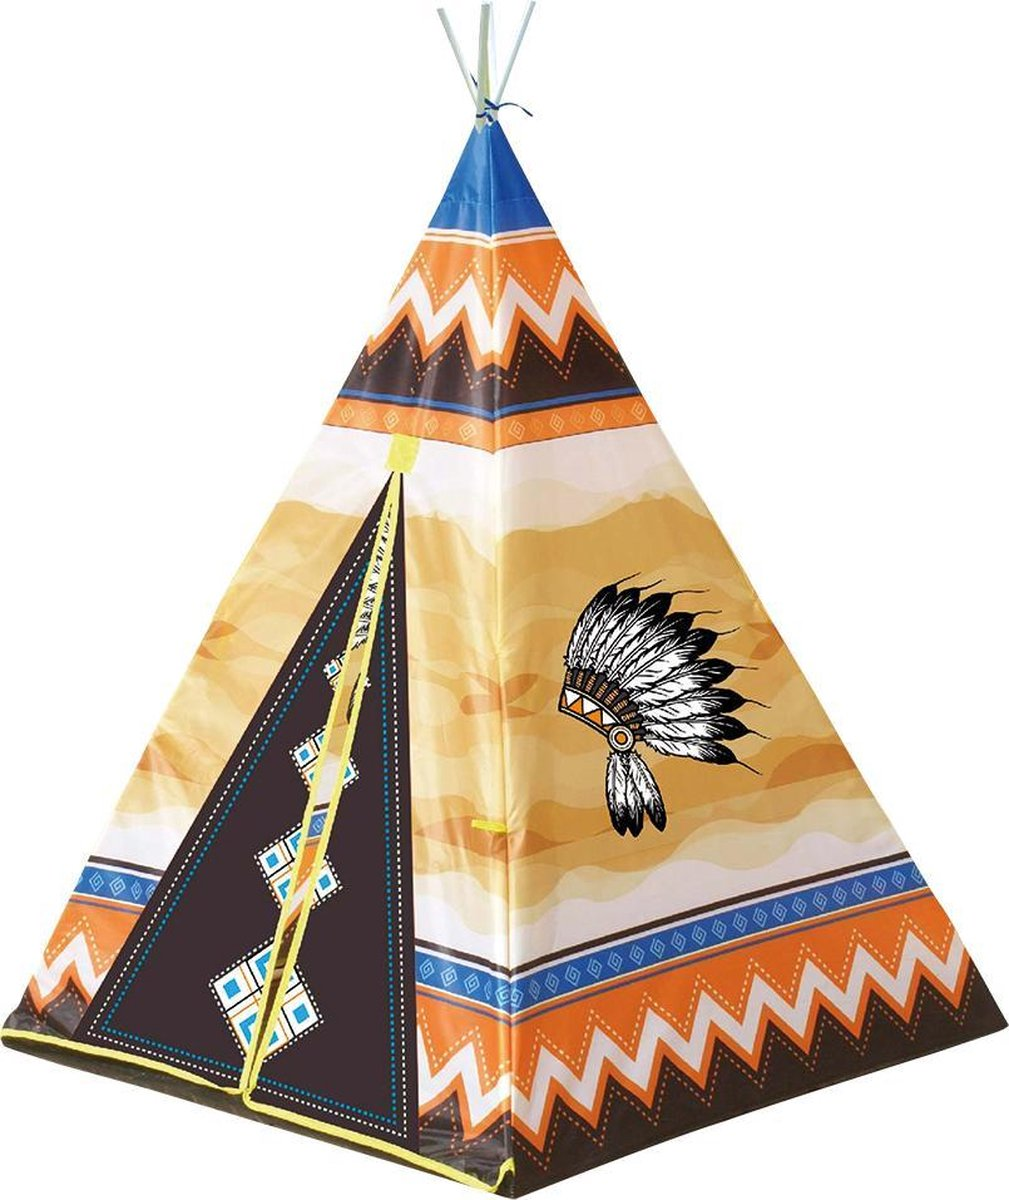 Wigwam indianen tipi tent - Kinder speeltent